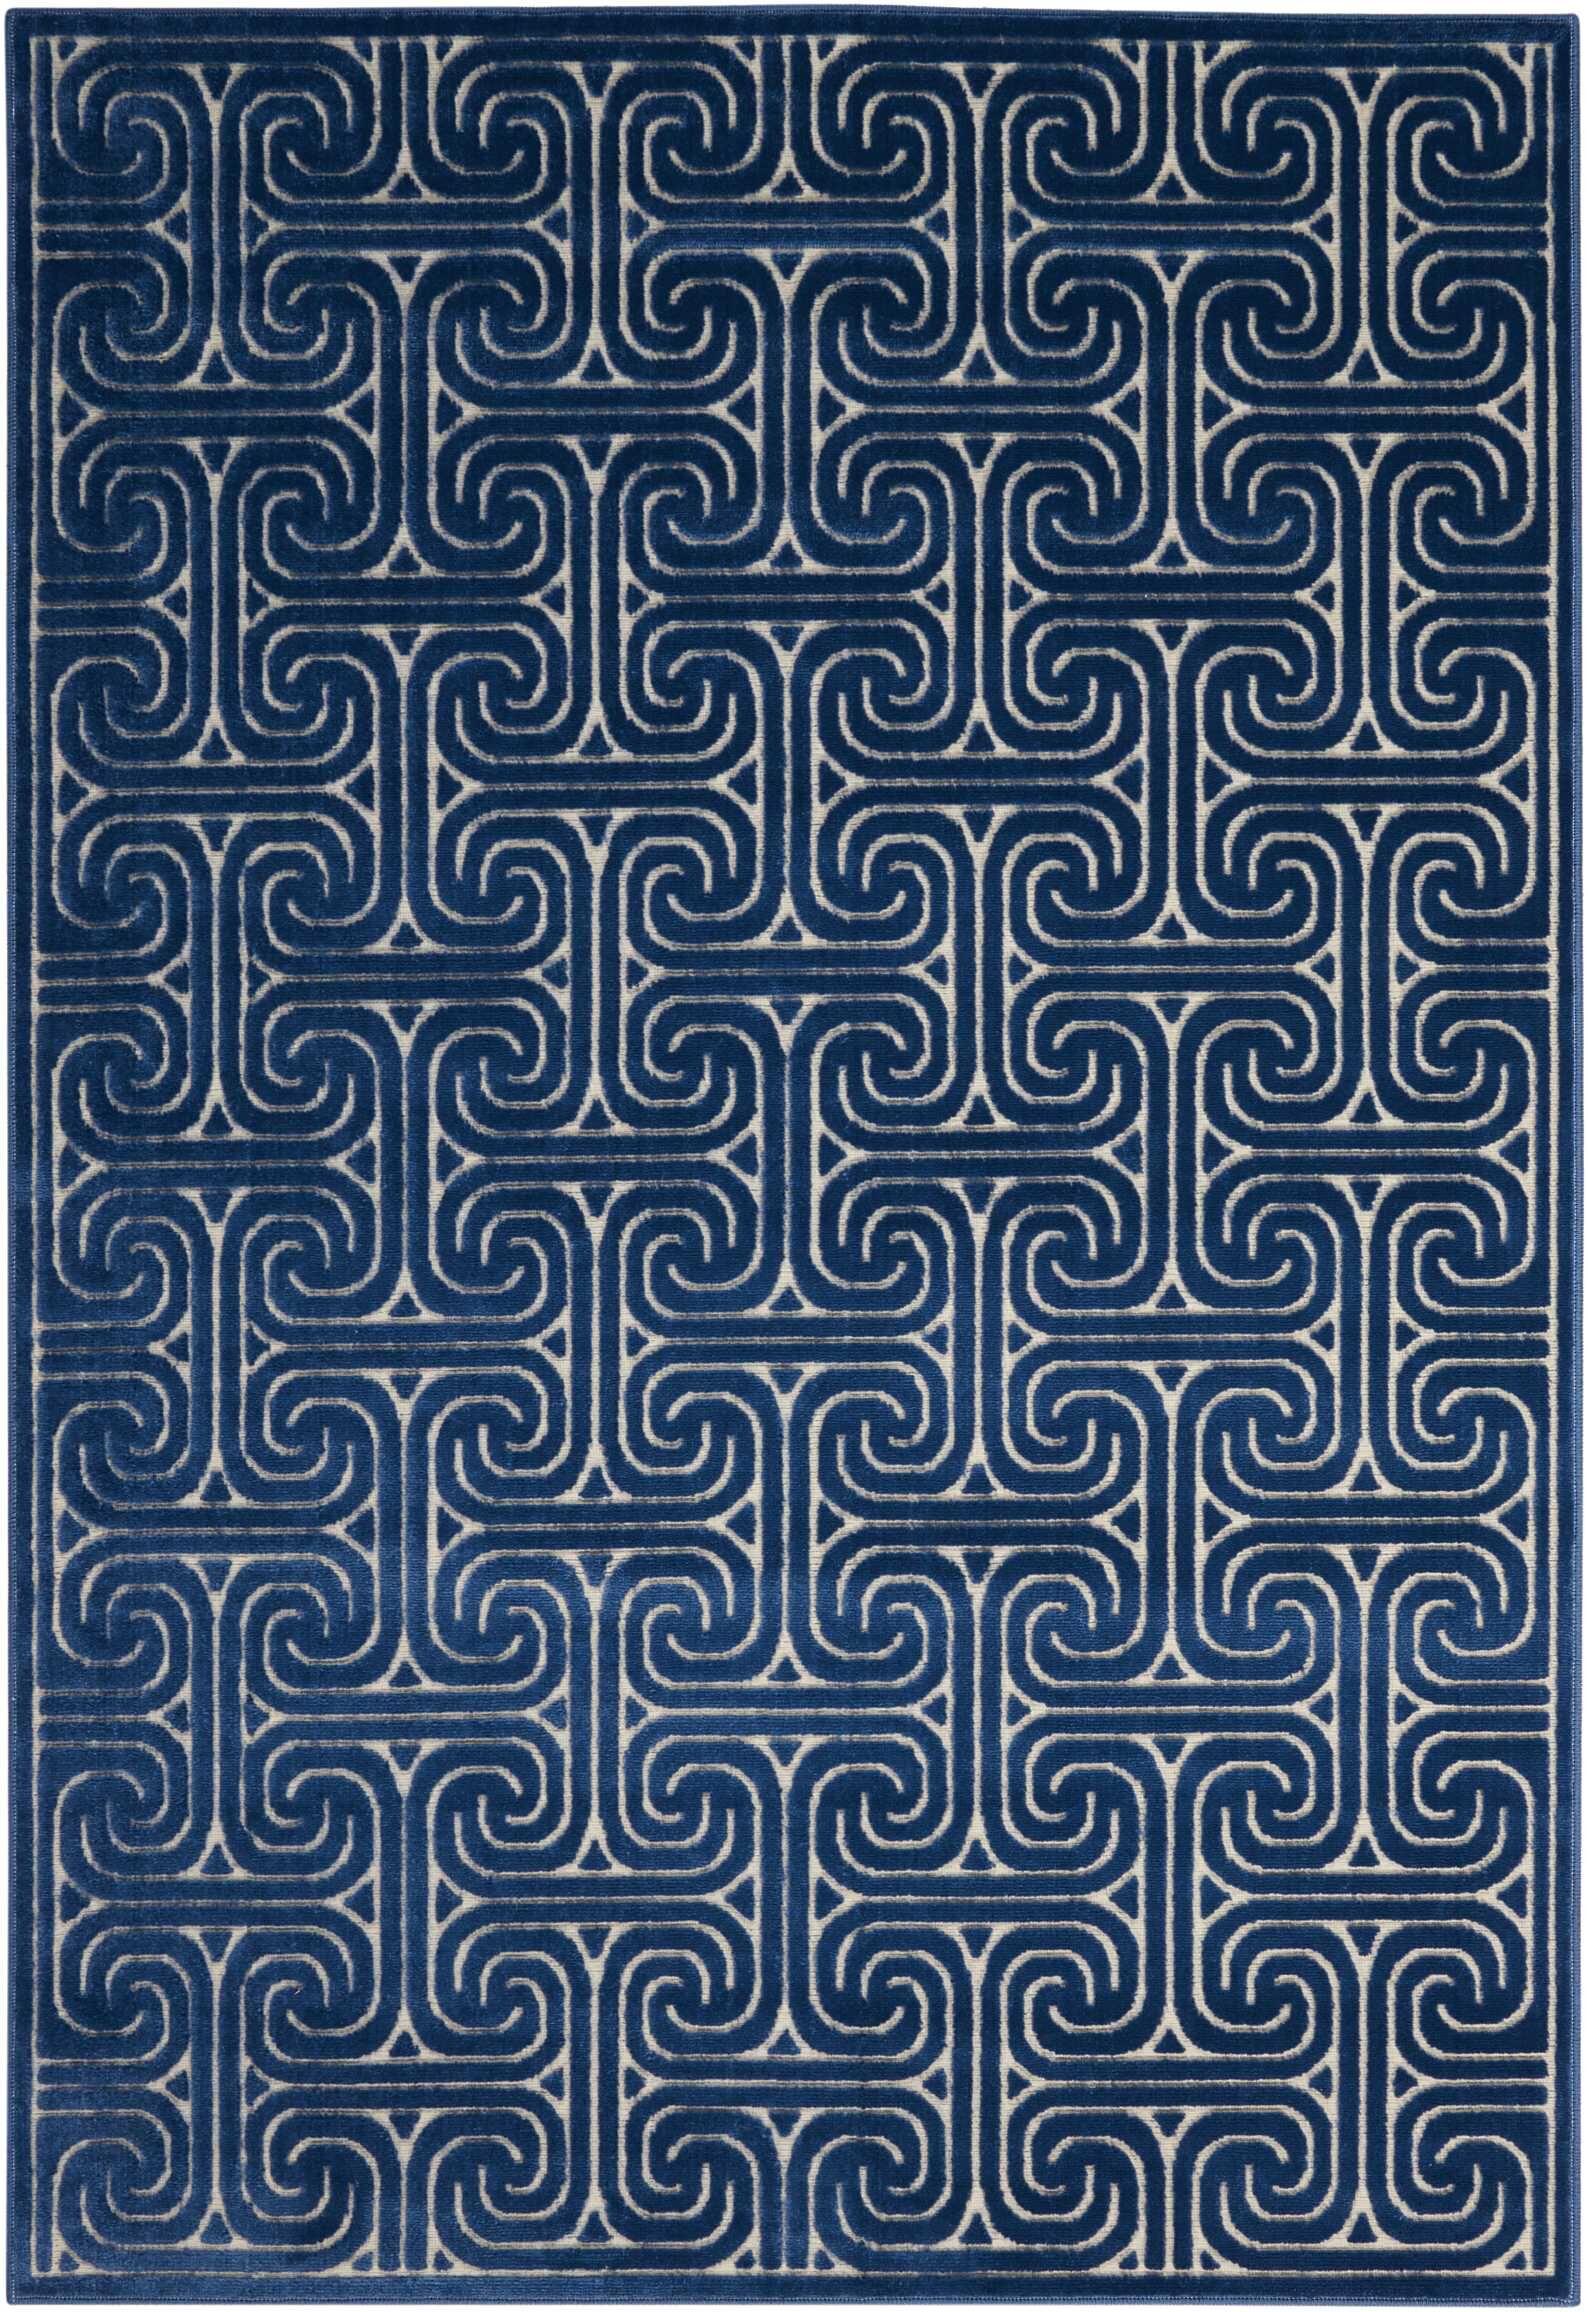 Interlock Ivory/Navy Indoor Area Rug Rug Size: Rectangle 3'6